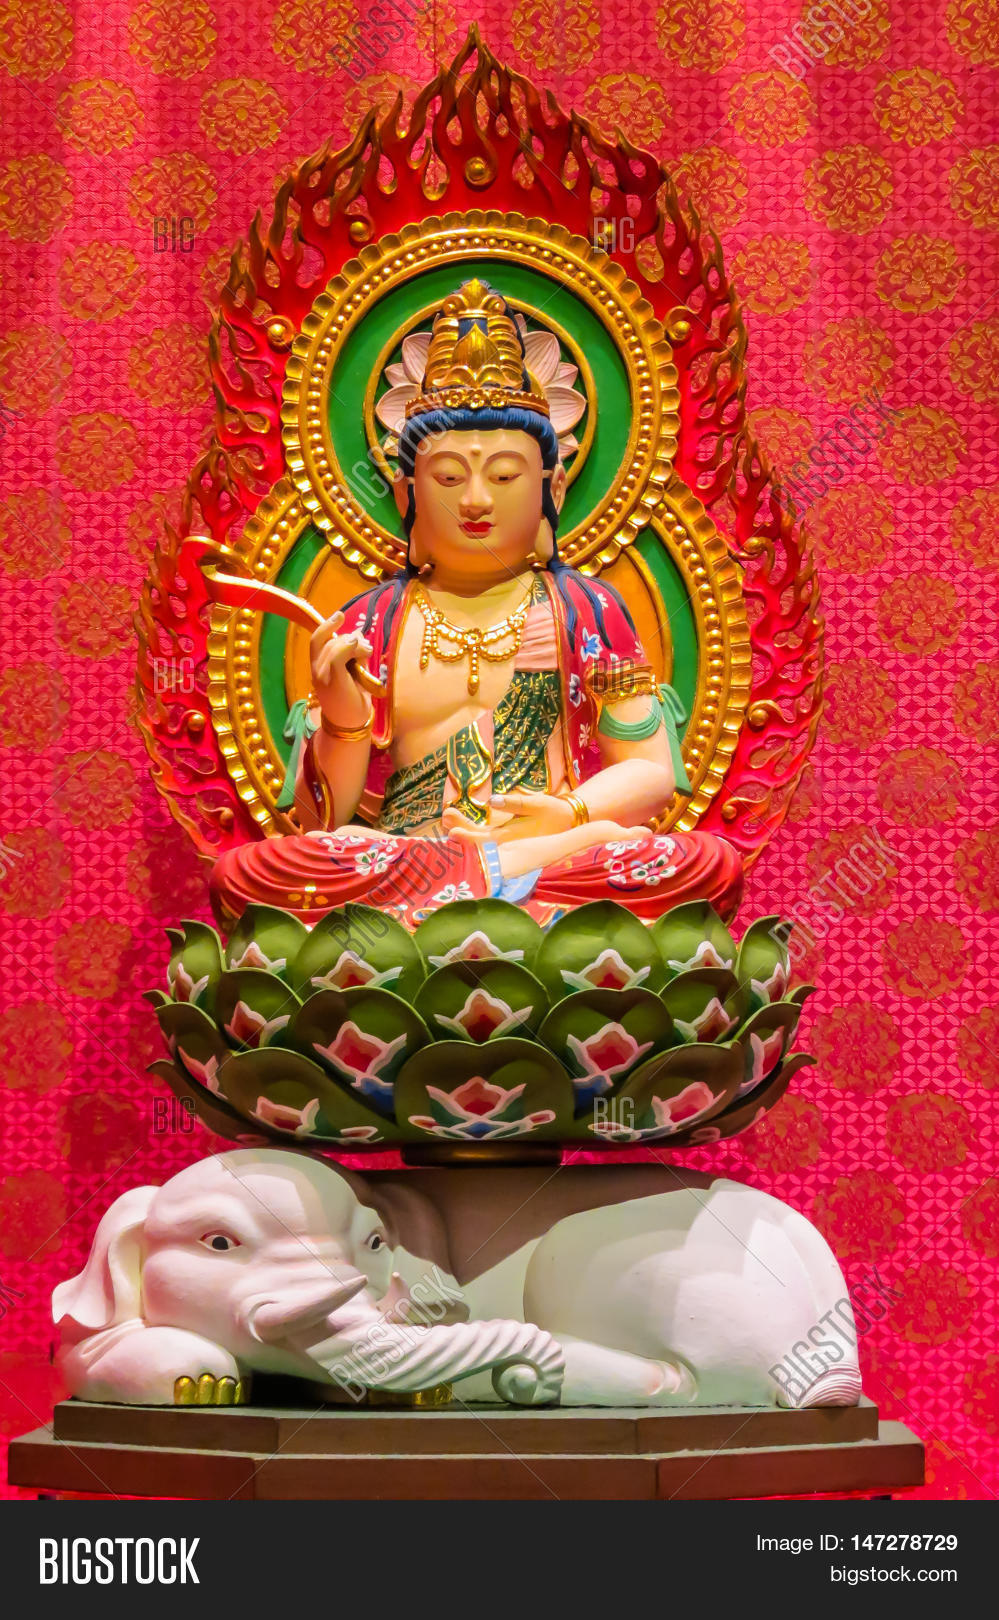 Buddha Image That Image Photo Free Trial Bigstock